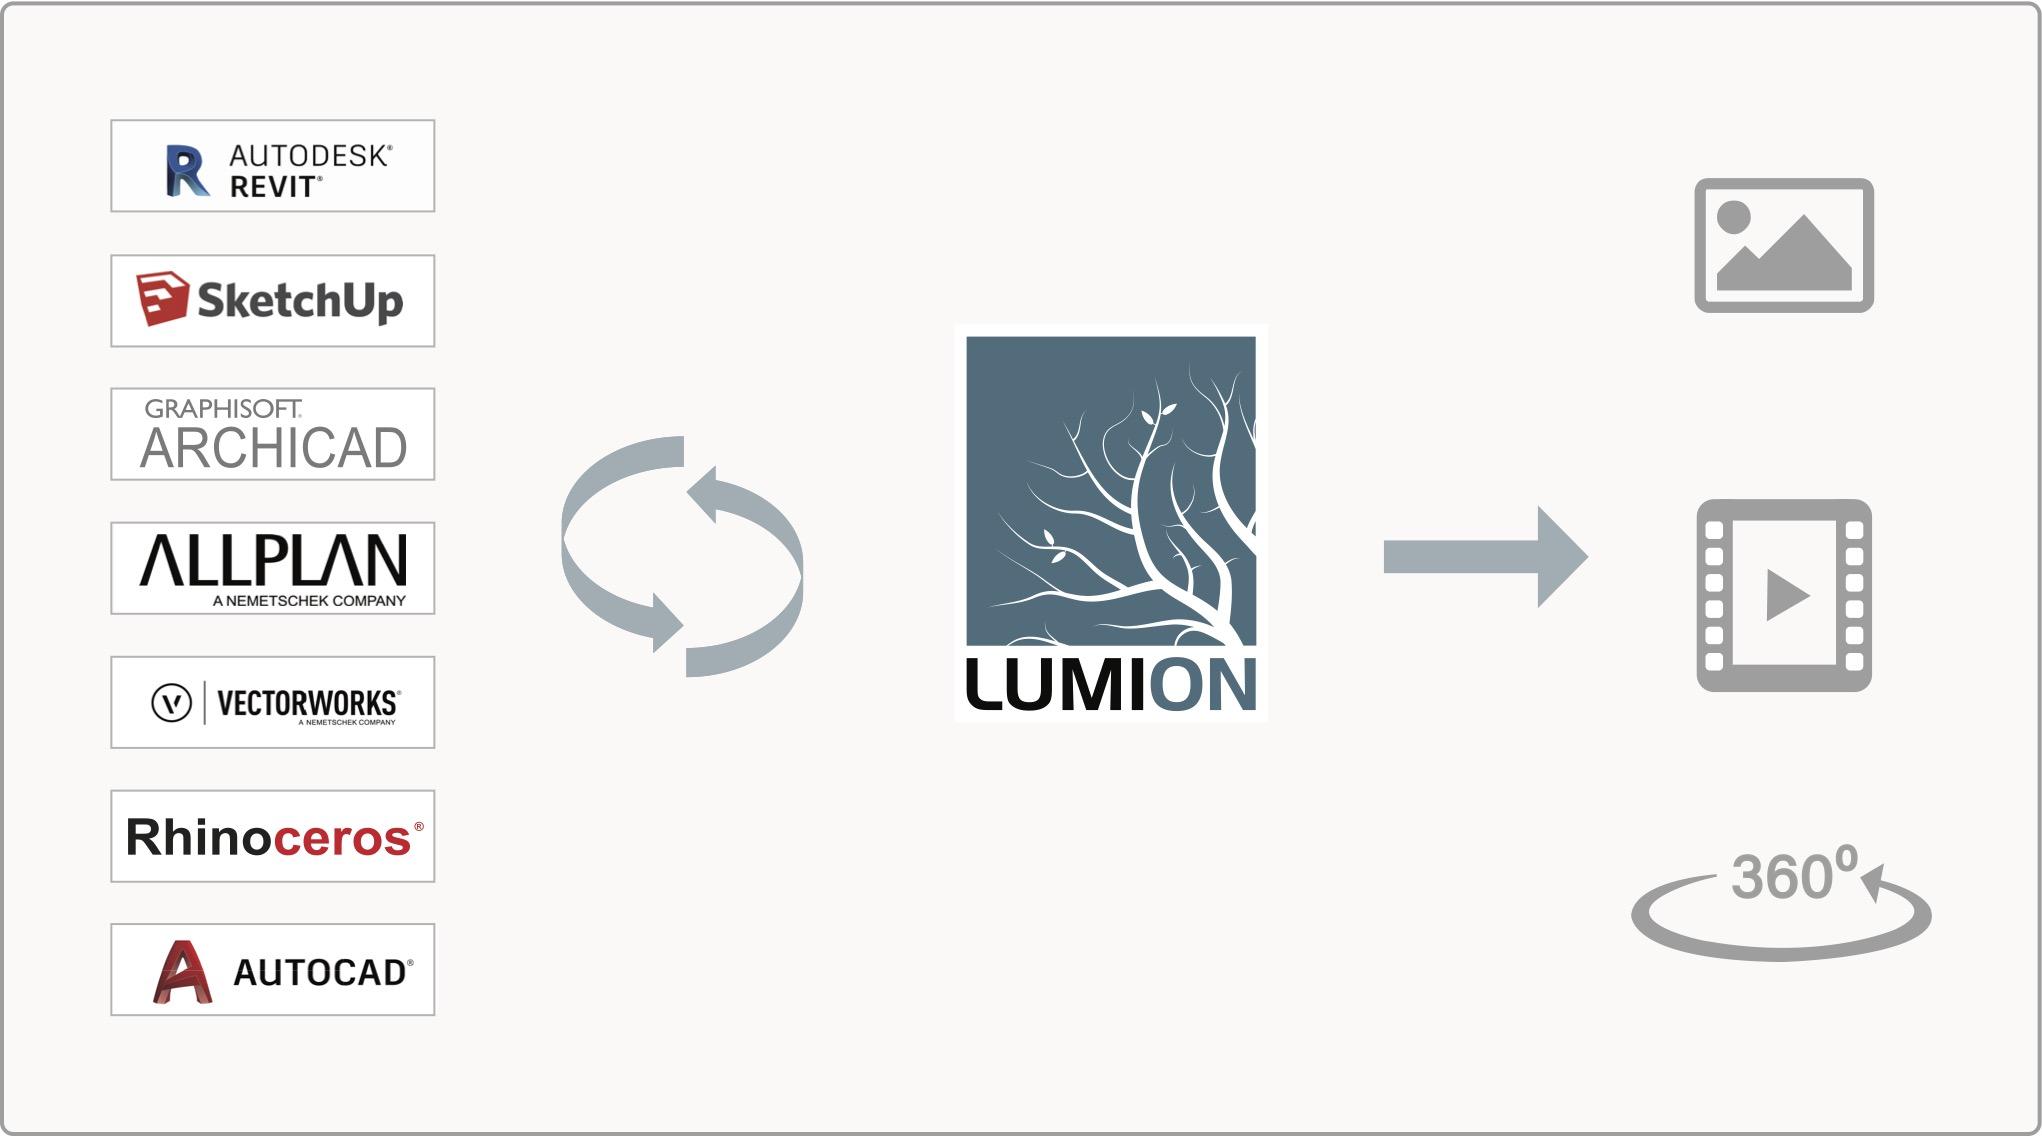 Workflow Lumion